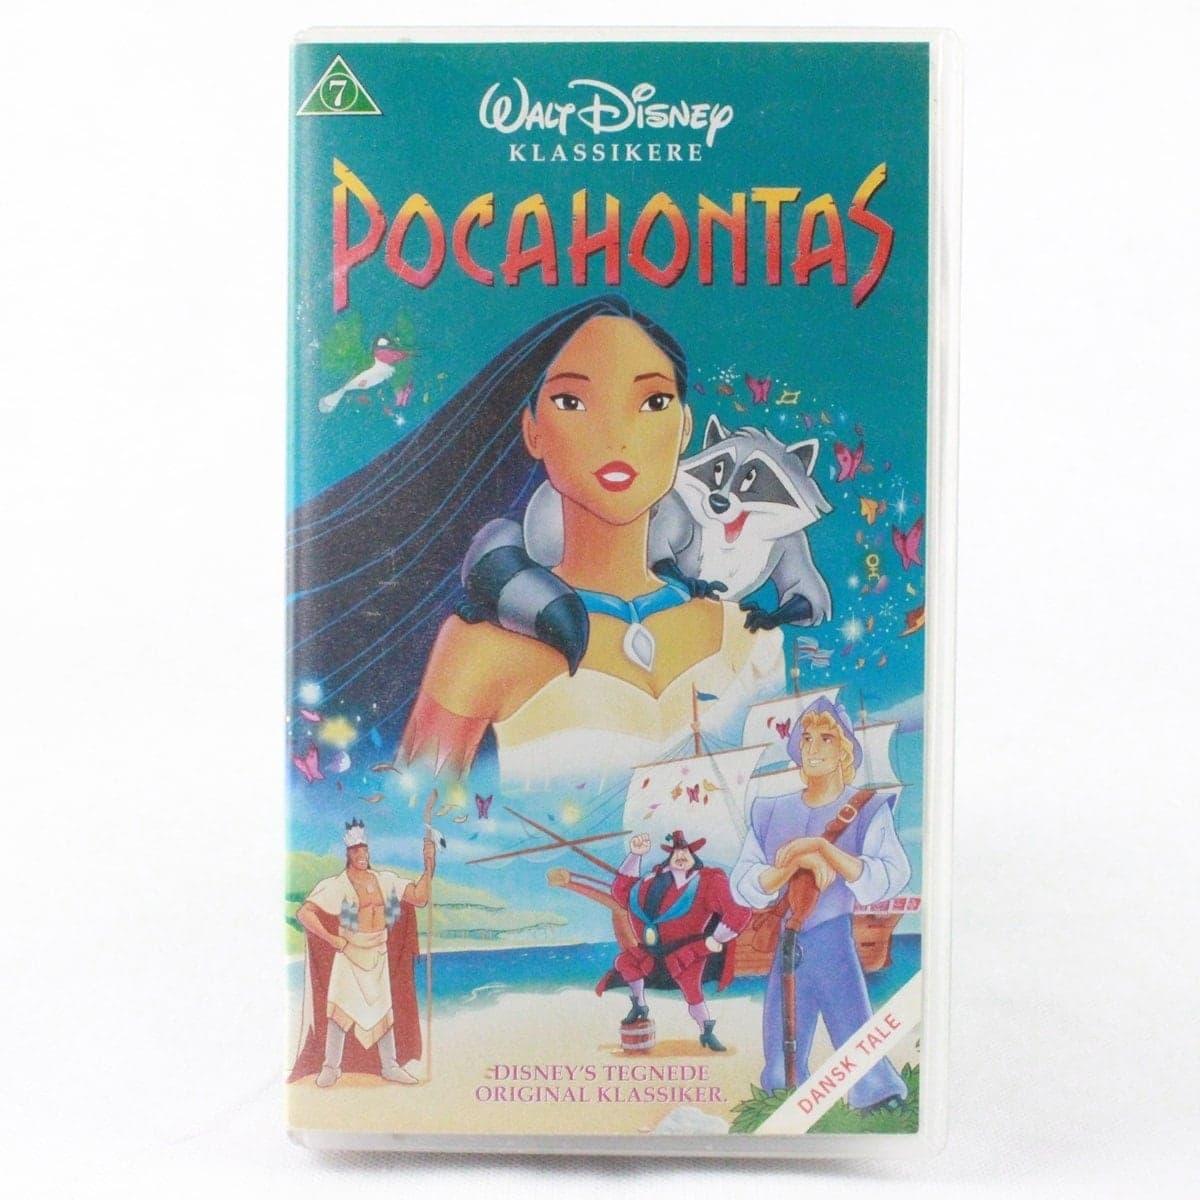 Pocahontas (VHS - Dansk tale)